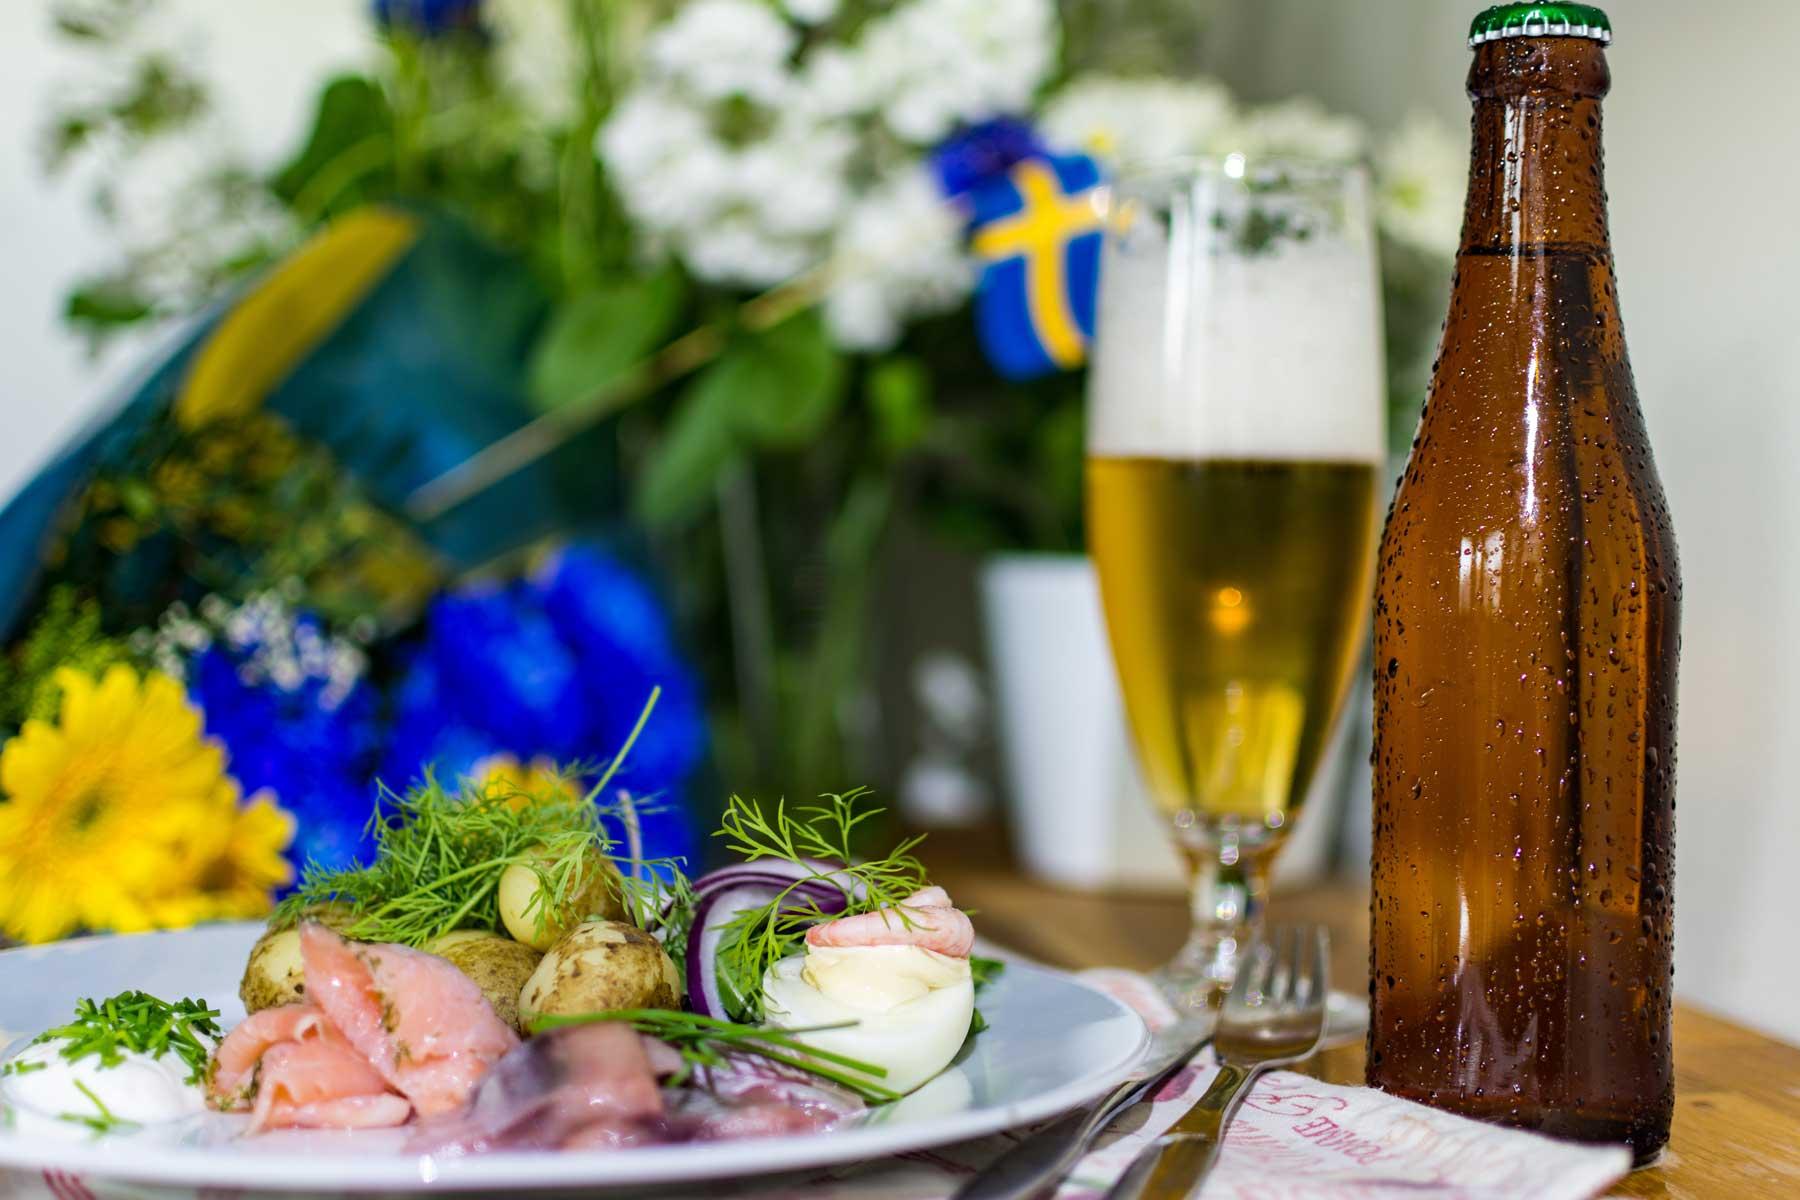 Swedish Midsummer Night celebration food